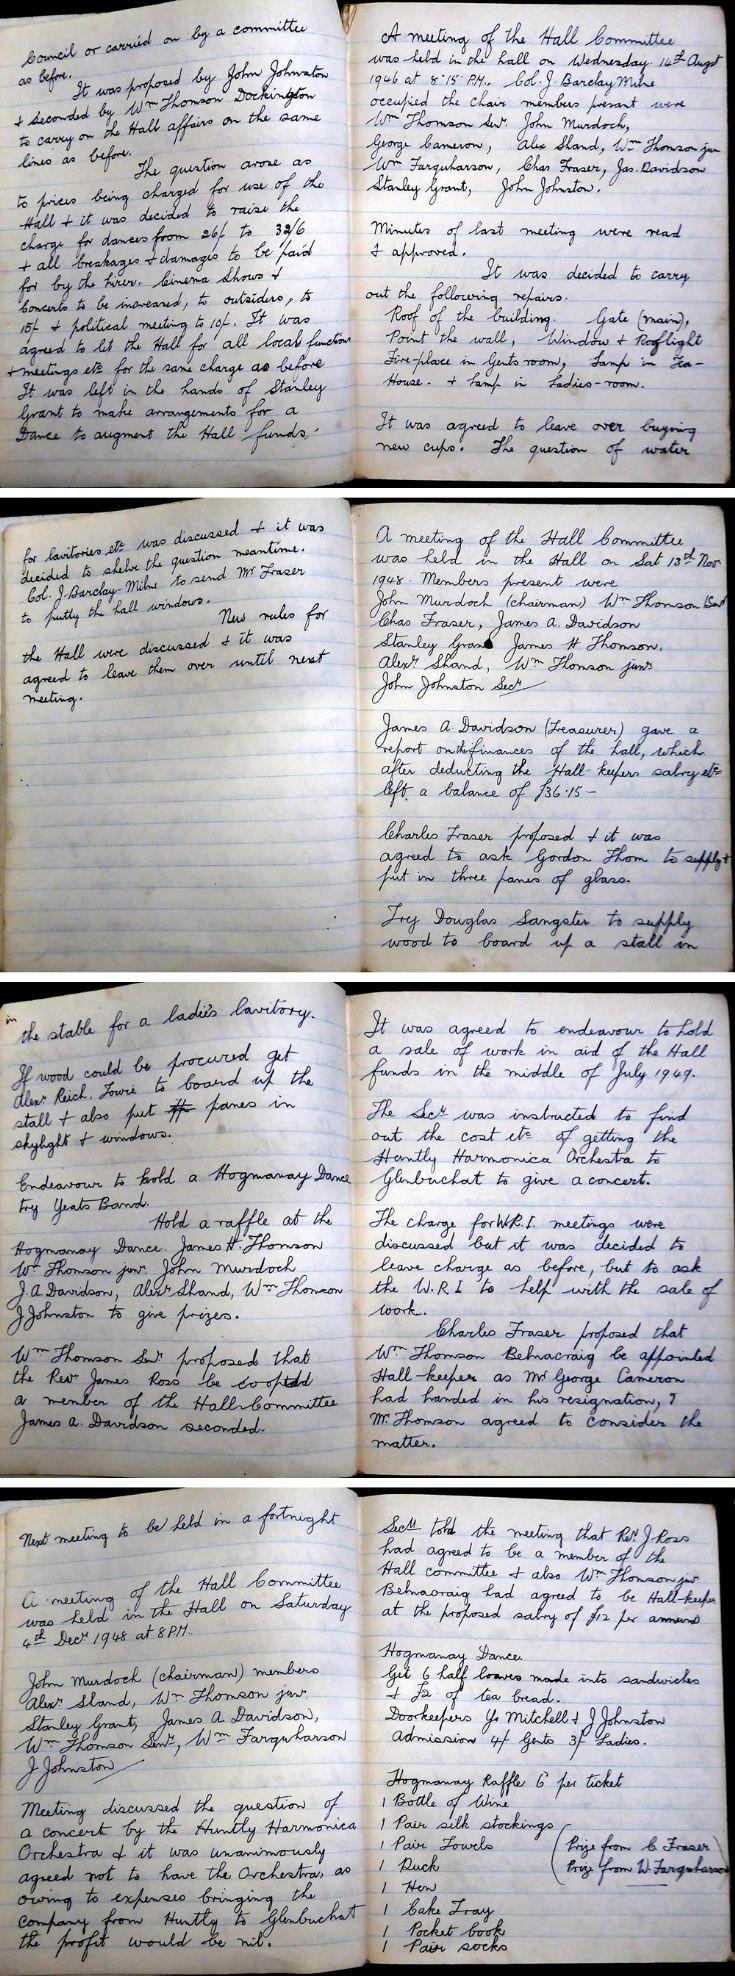 38 Glenbuchat Hall Committee Minutes